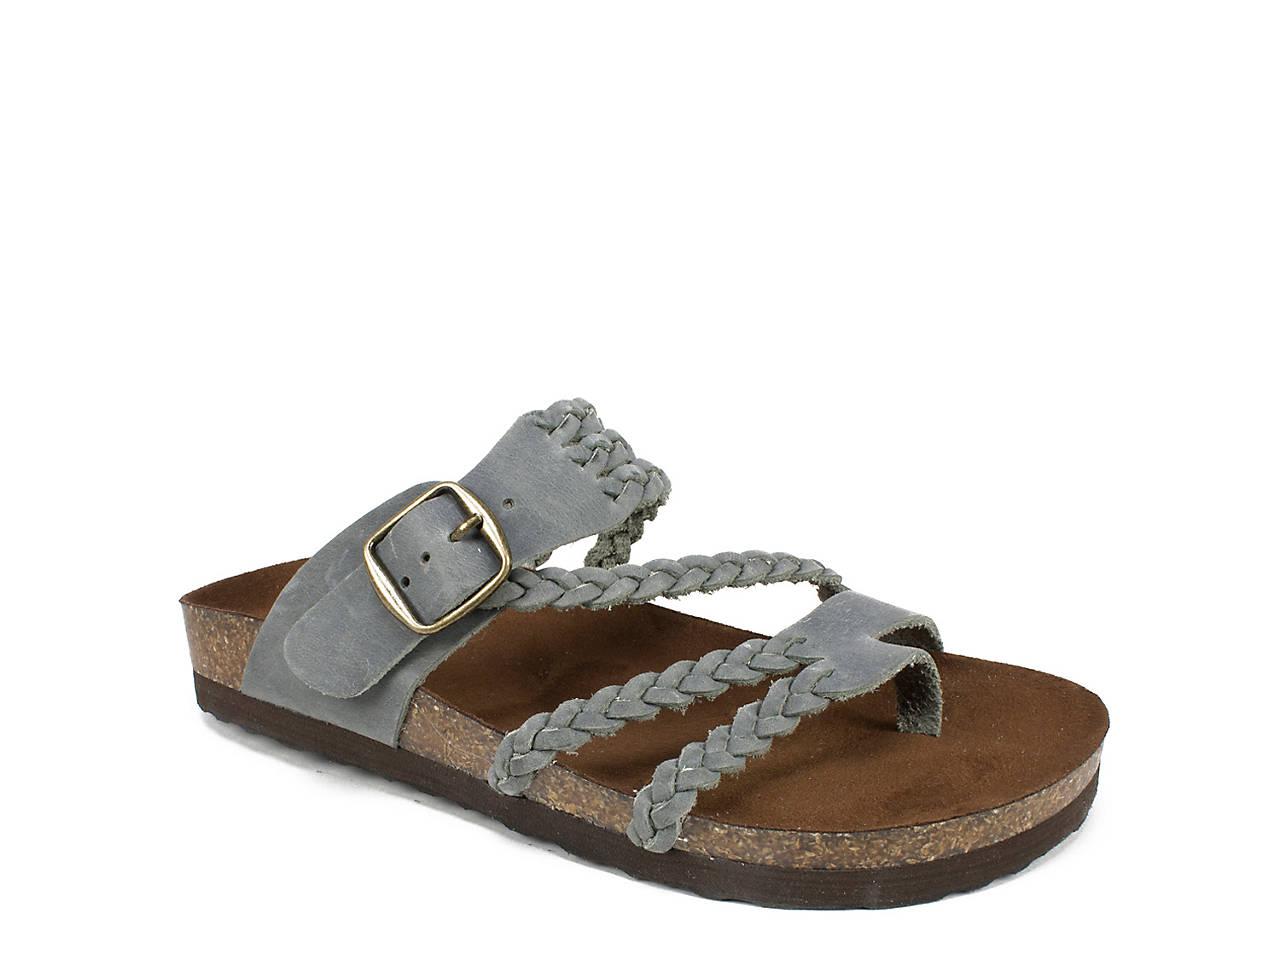 9c21c21be61 Hayleigh Sandal